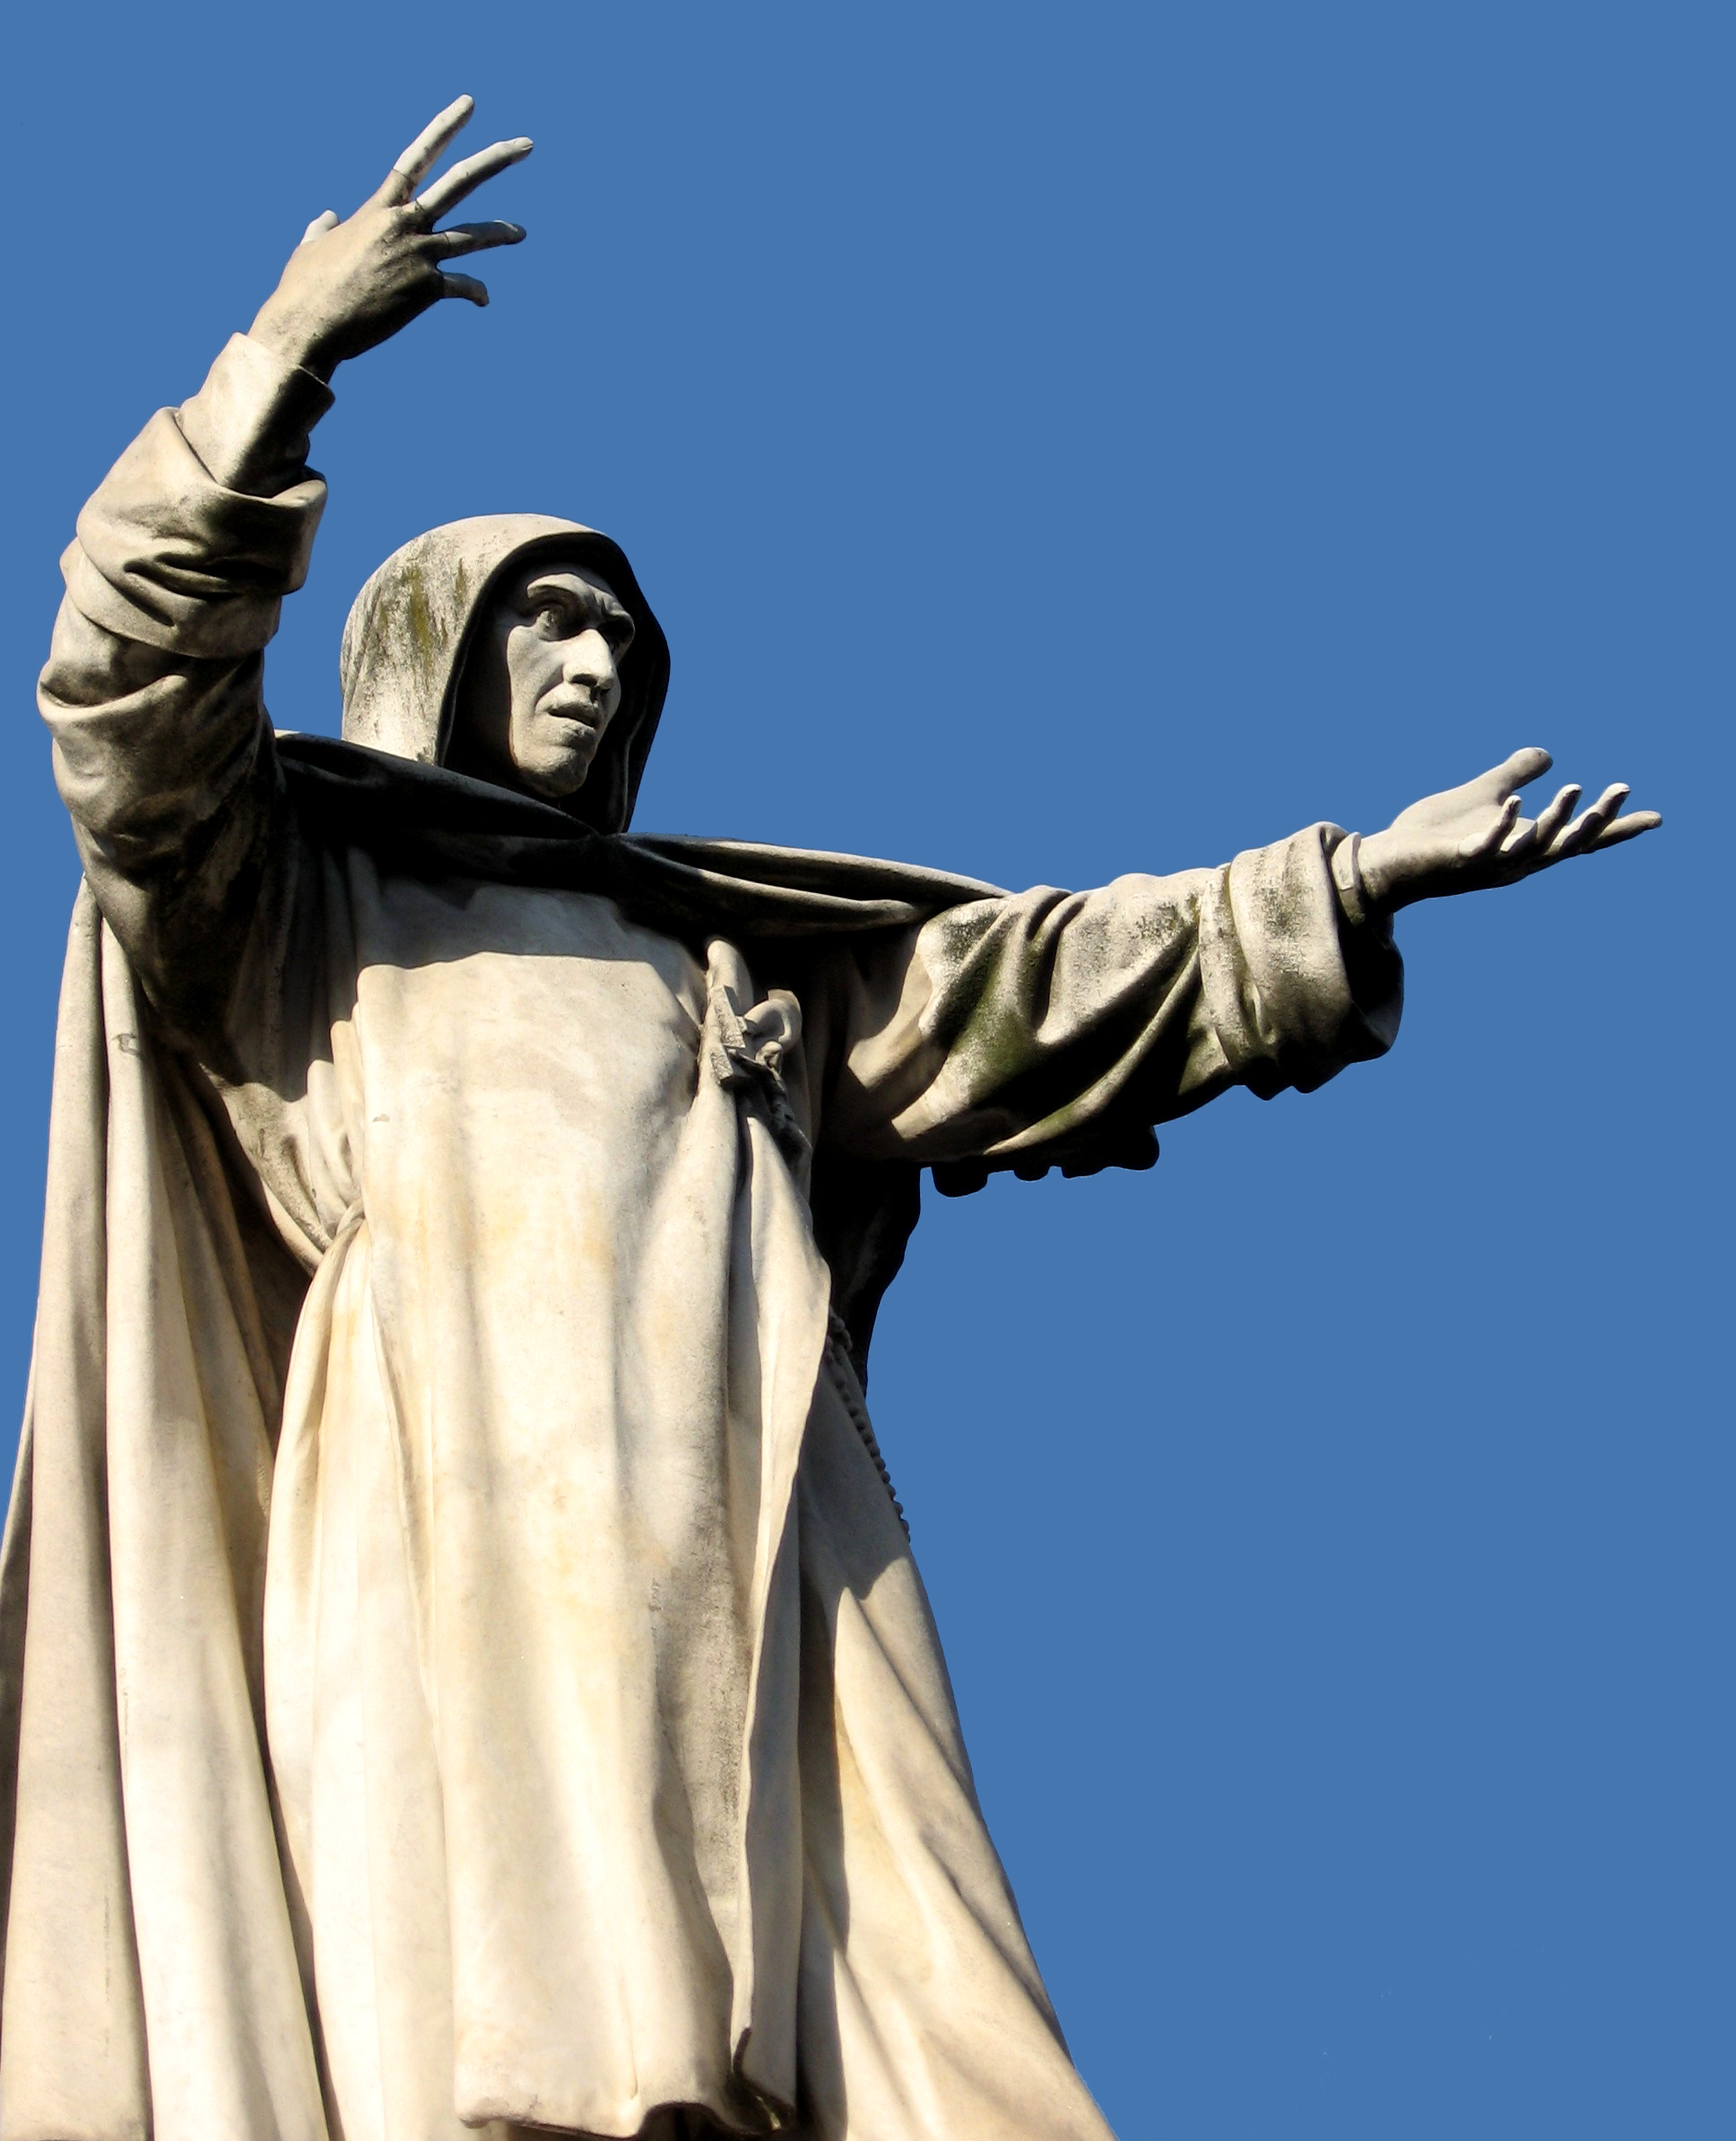 File:Savonarola monument, Ferrara.jpg - Wikimedia Commons